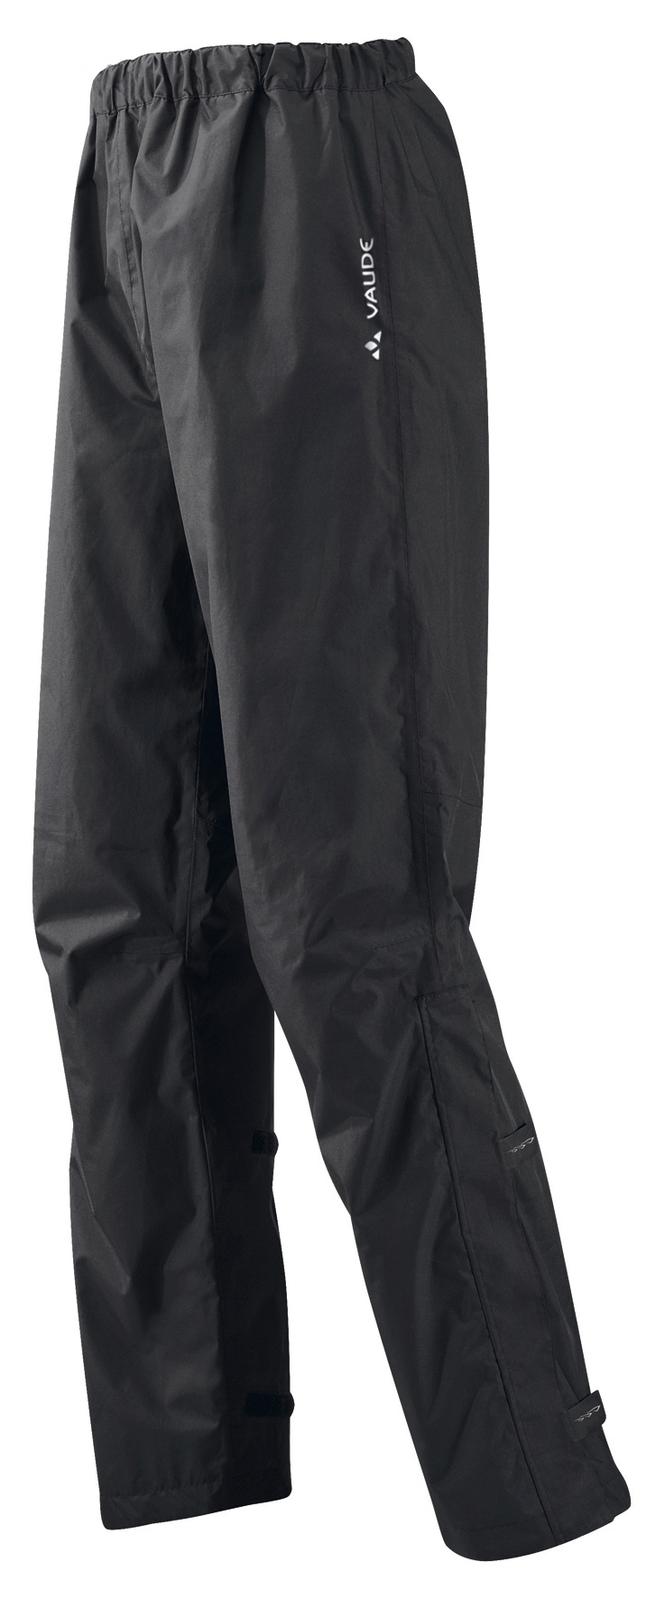 VAUDE Men´s Fluid Pants II S/S+L/S black Größe XXL-Long - schneider-sports